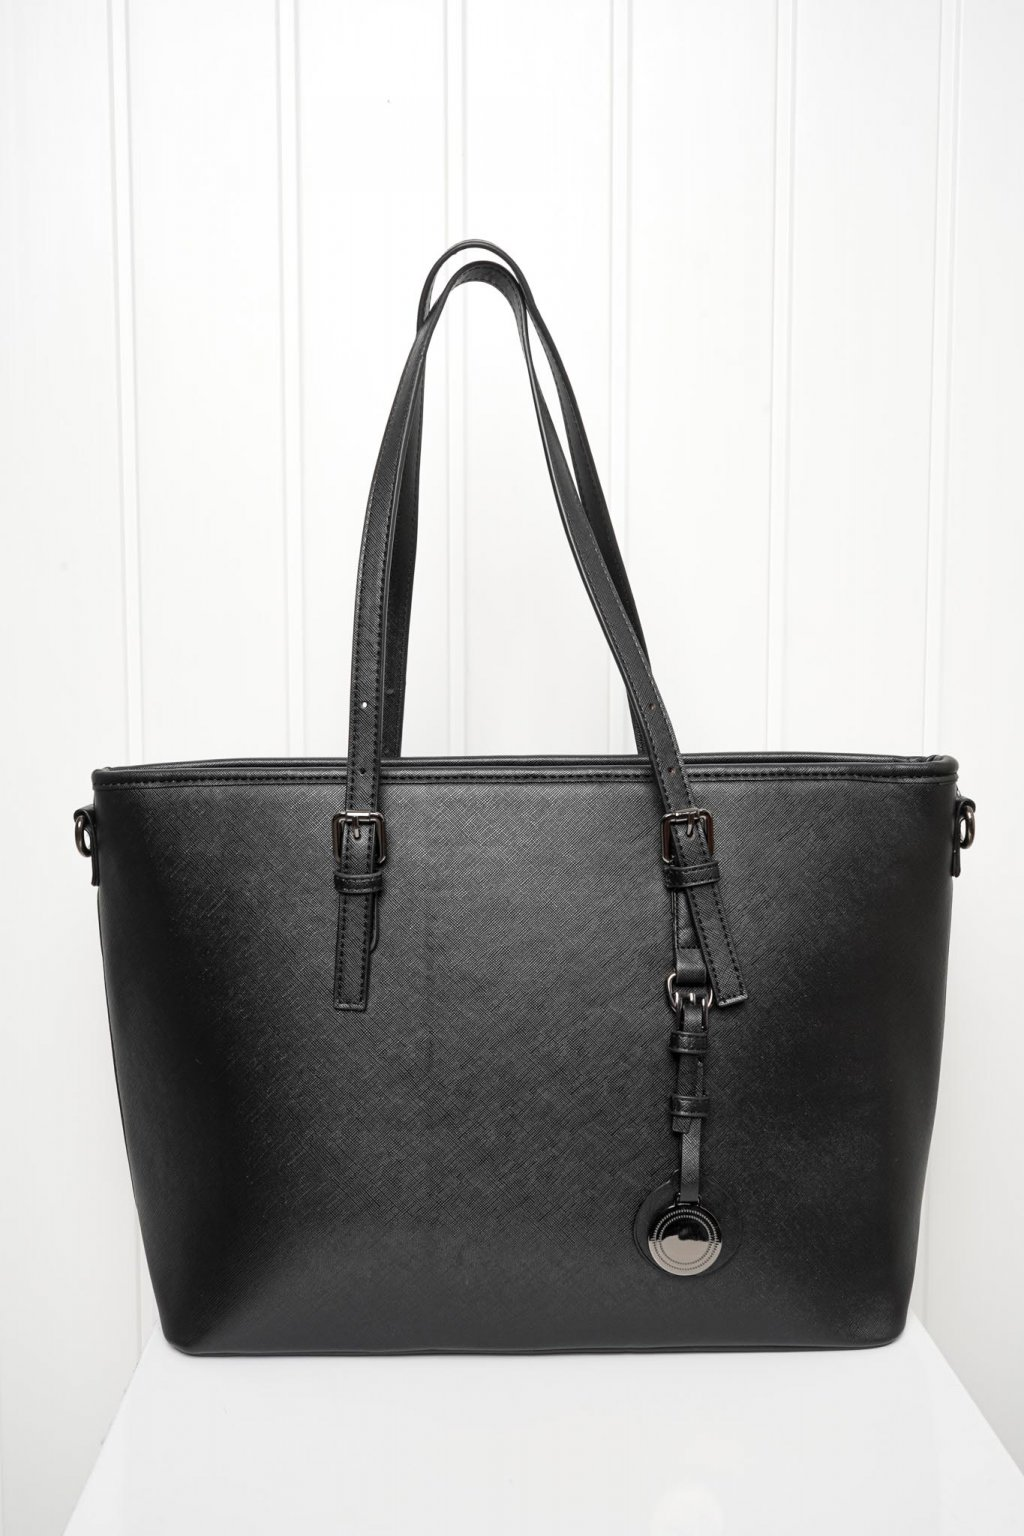 Kabelka, crossbody, ruksak, shopping bag, shopperka, 030